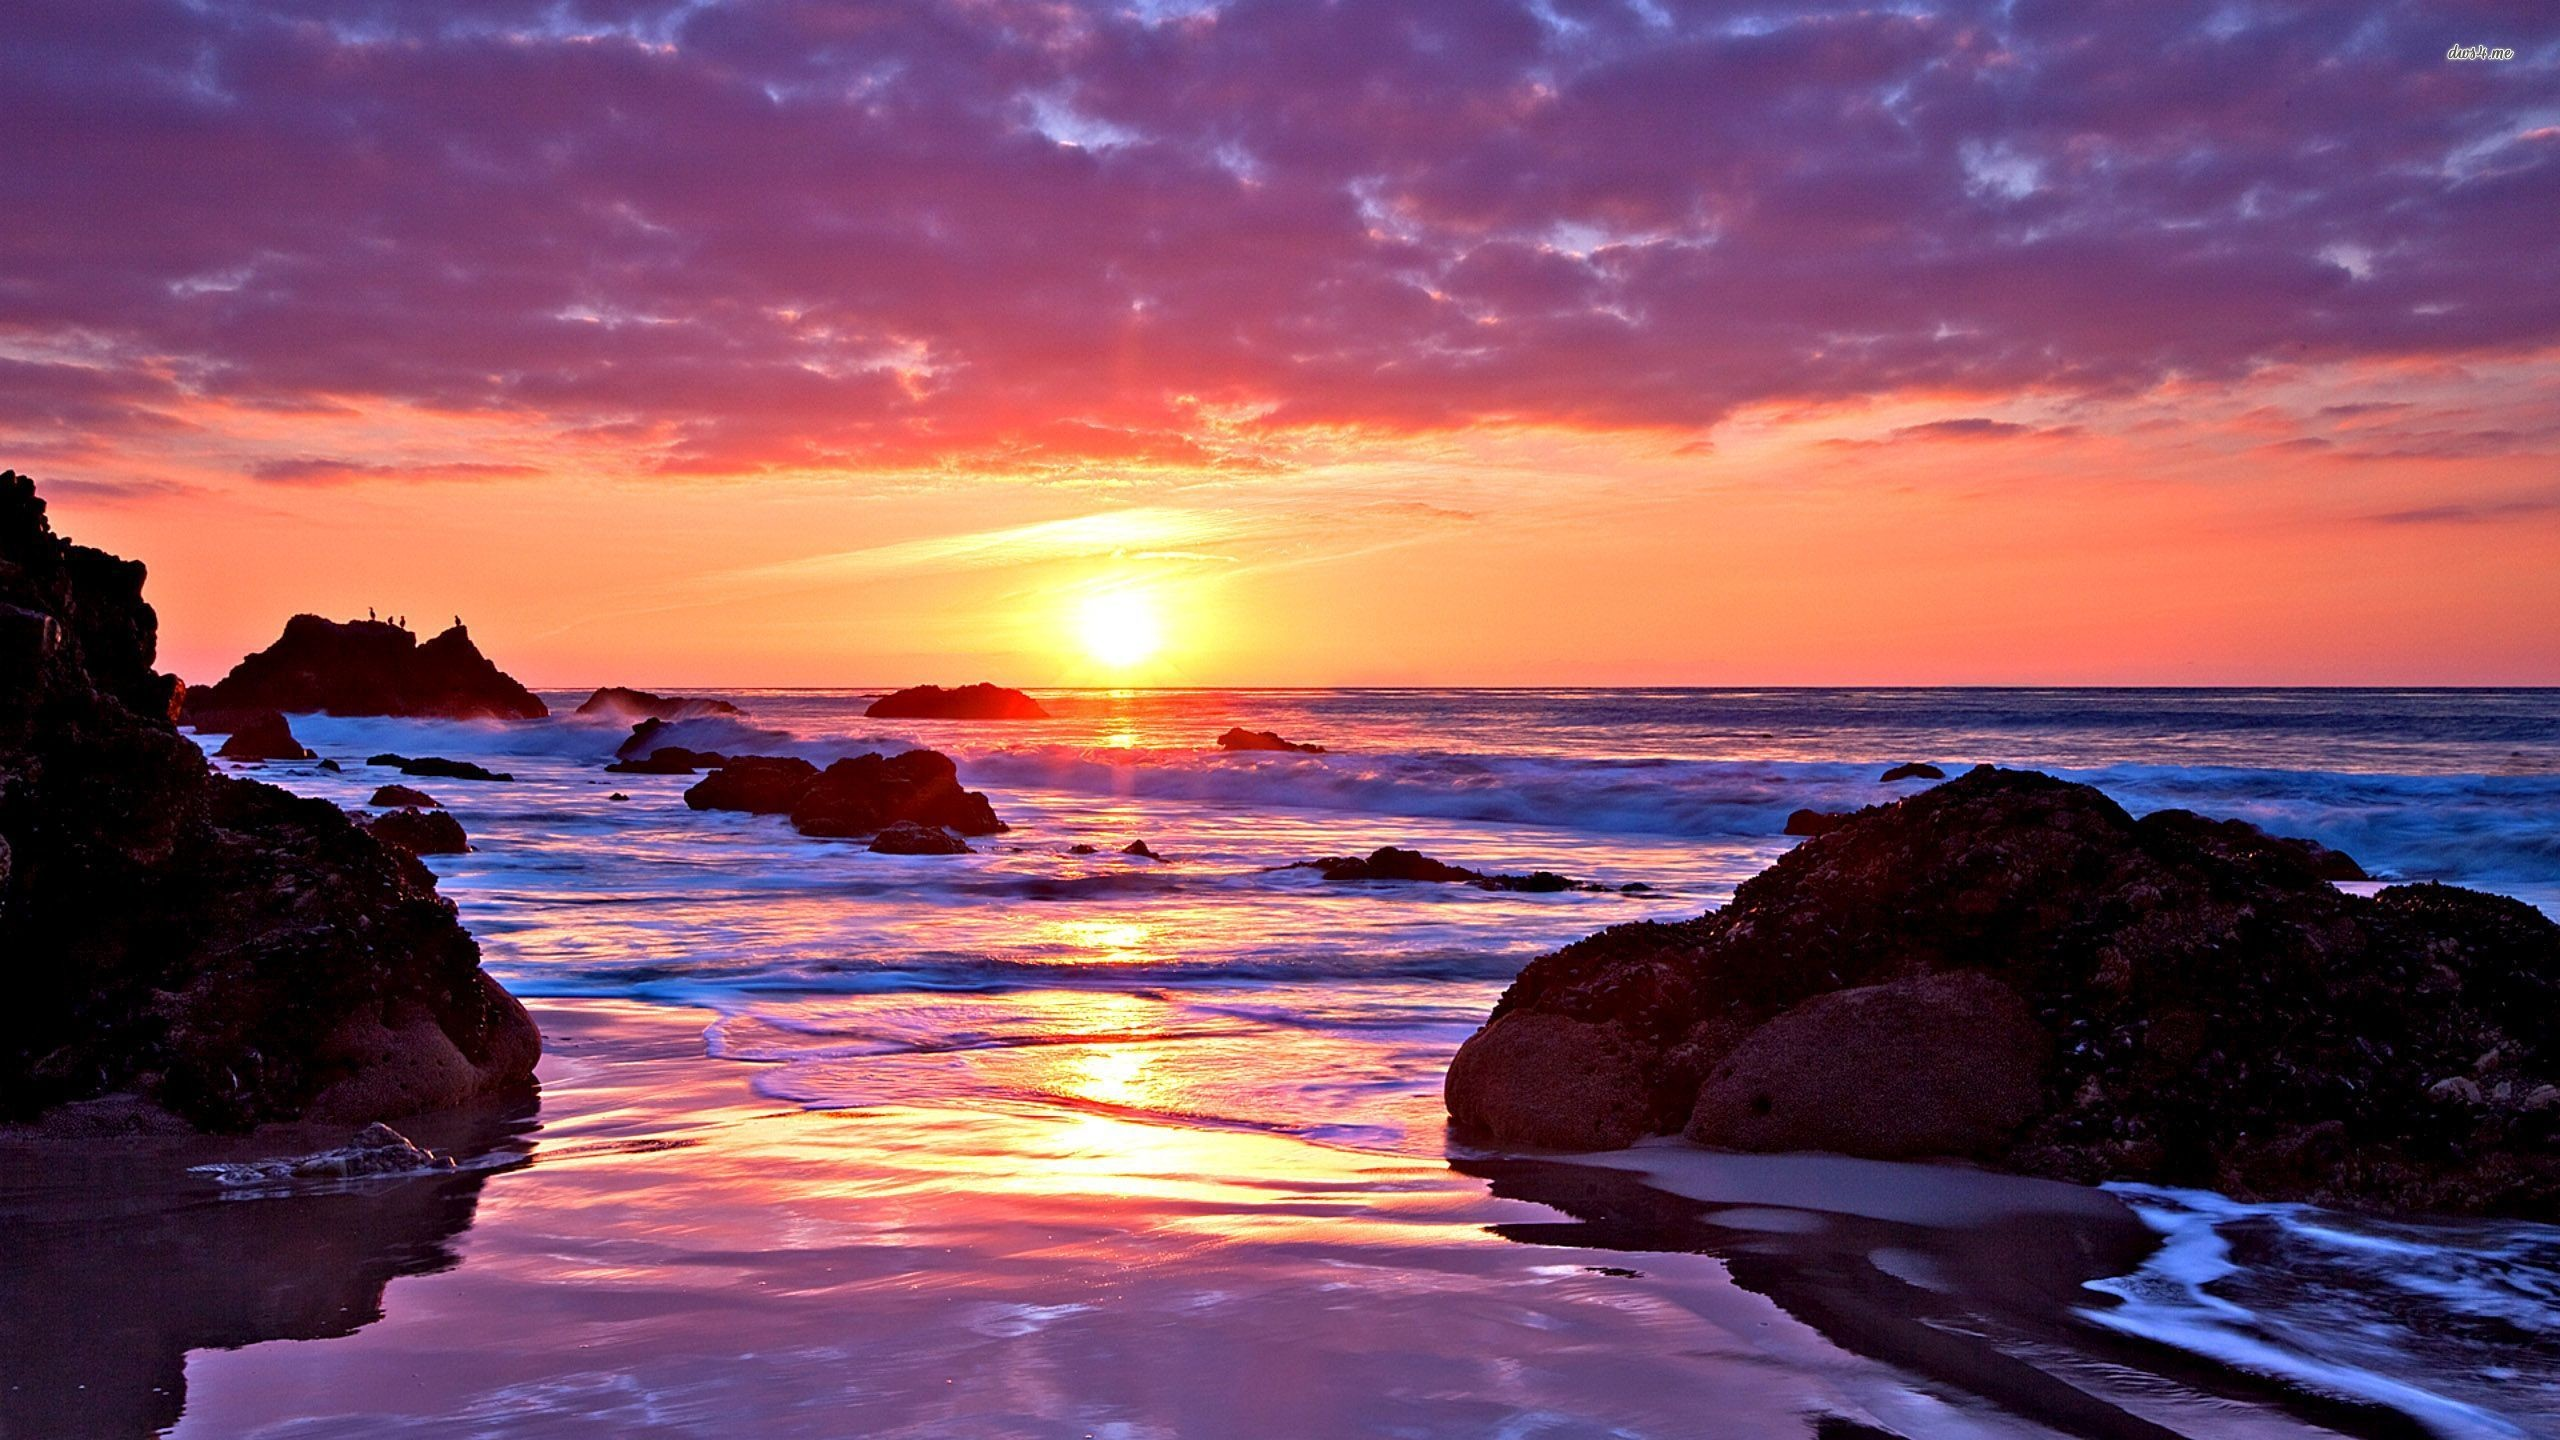 —ocean-sunset-wallpapers-5038